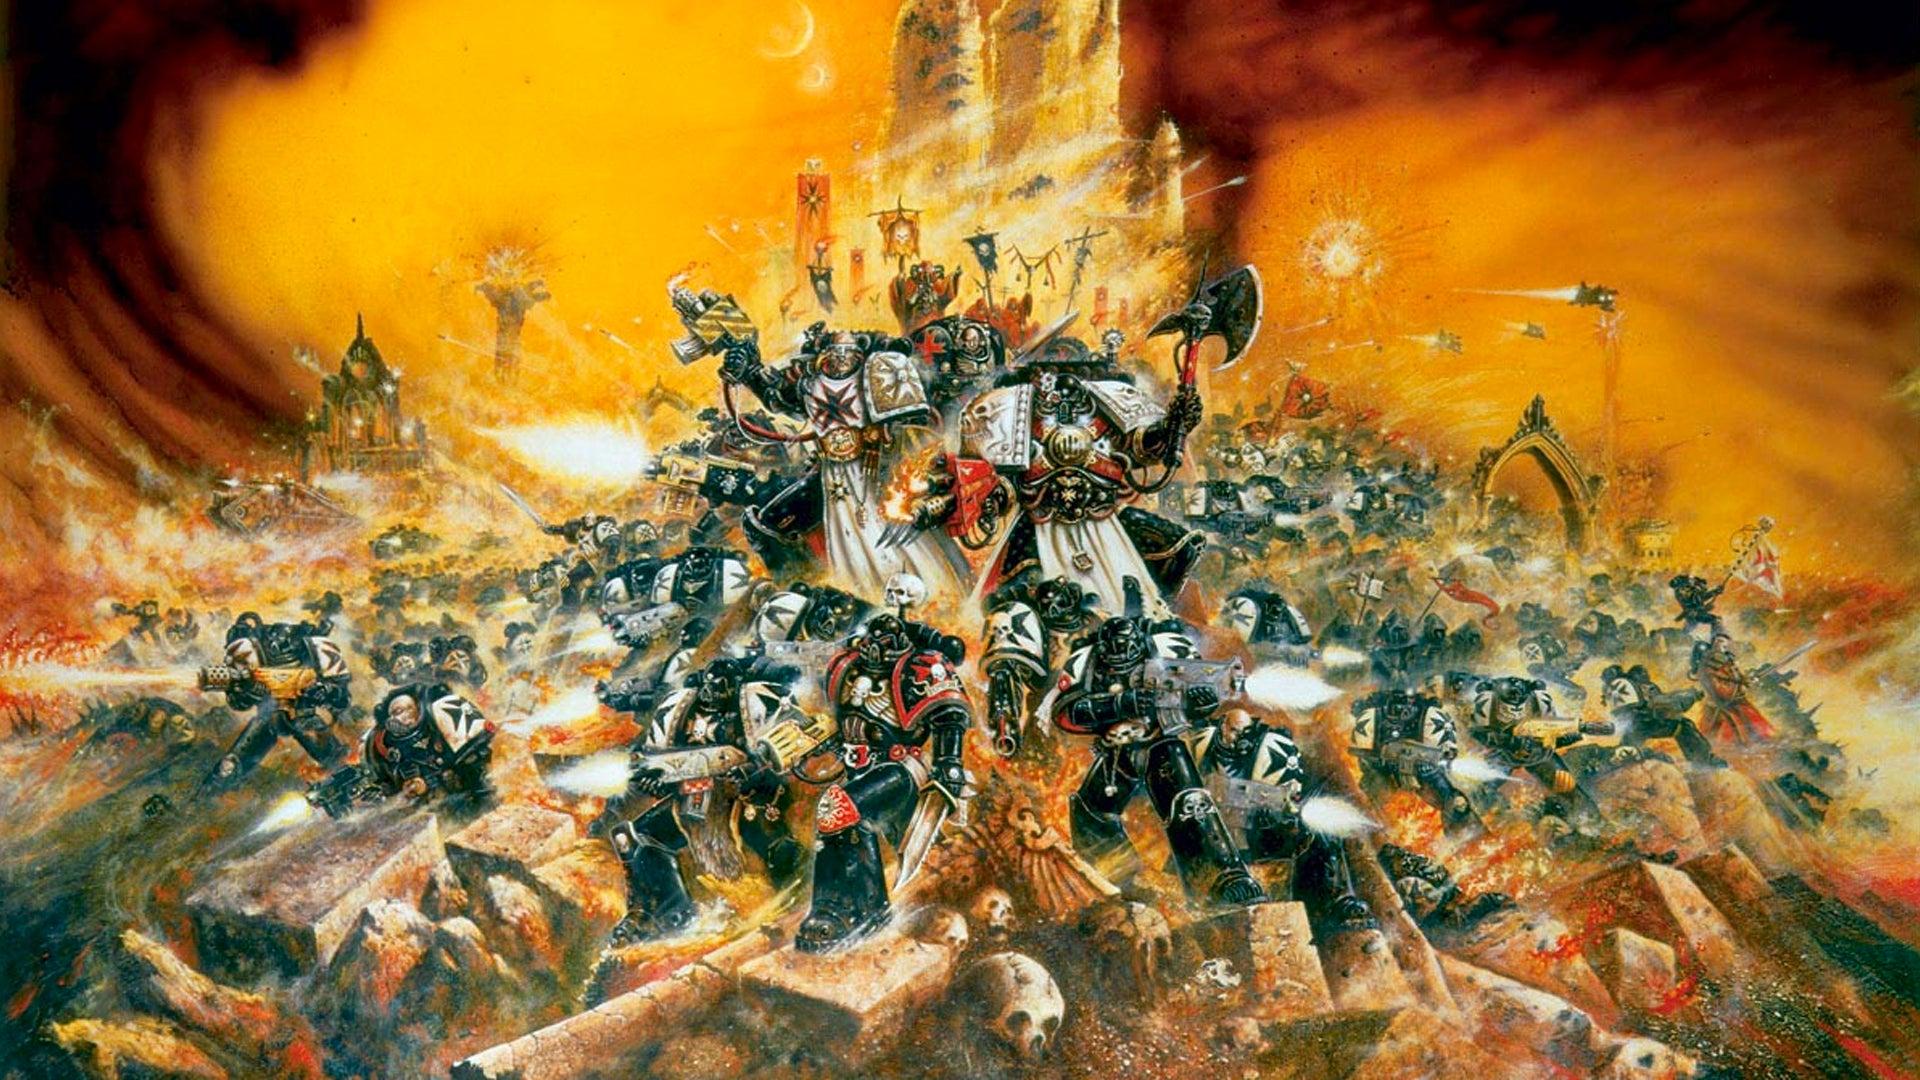 warhammer-art-black-templars-john-blanche.jpg